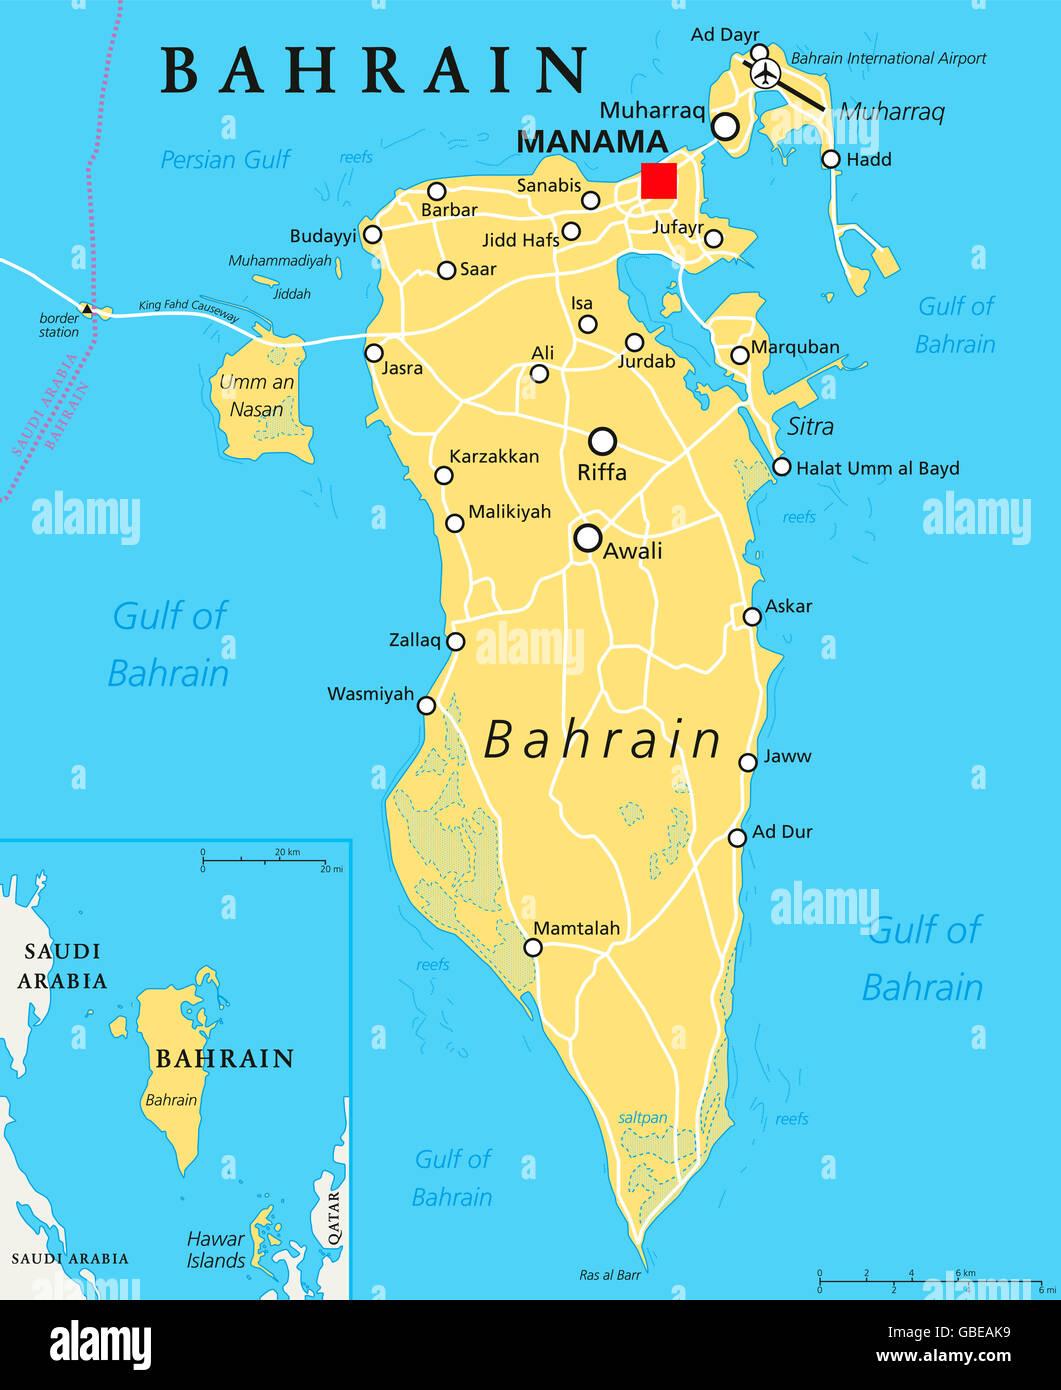 Bahrain Political Map With Capital Manama Island Country Stock - Bahrain map